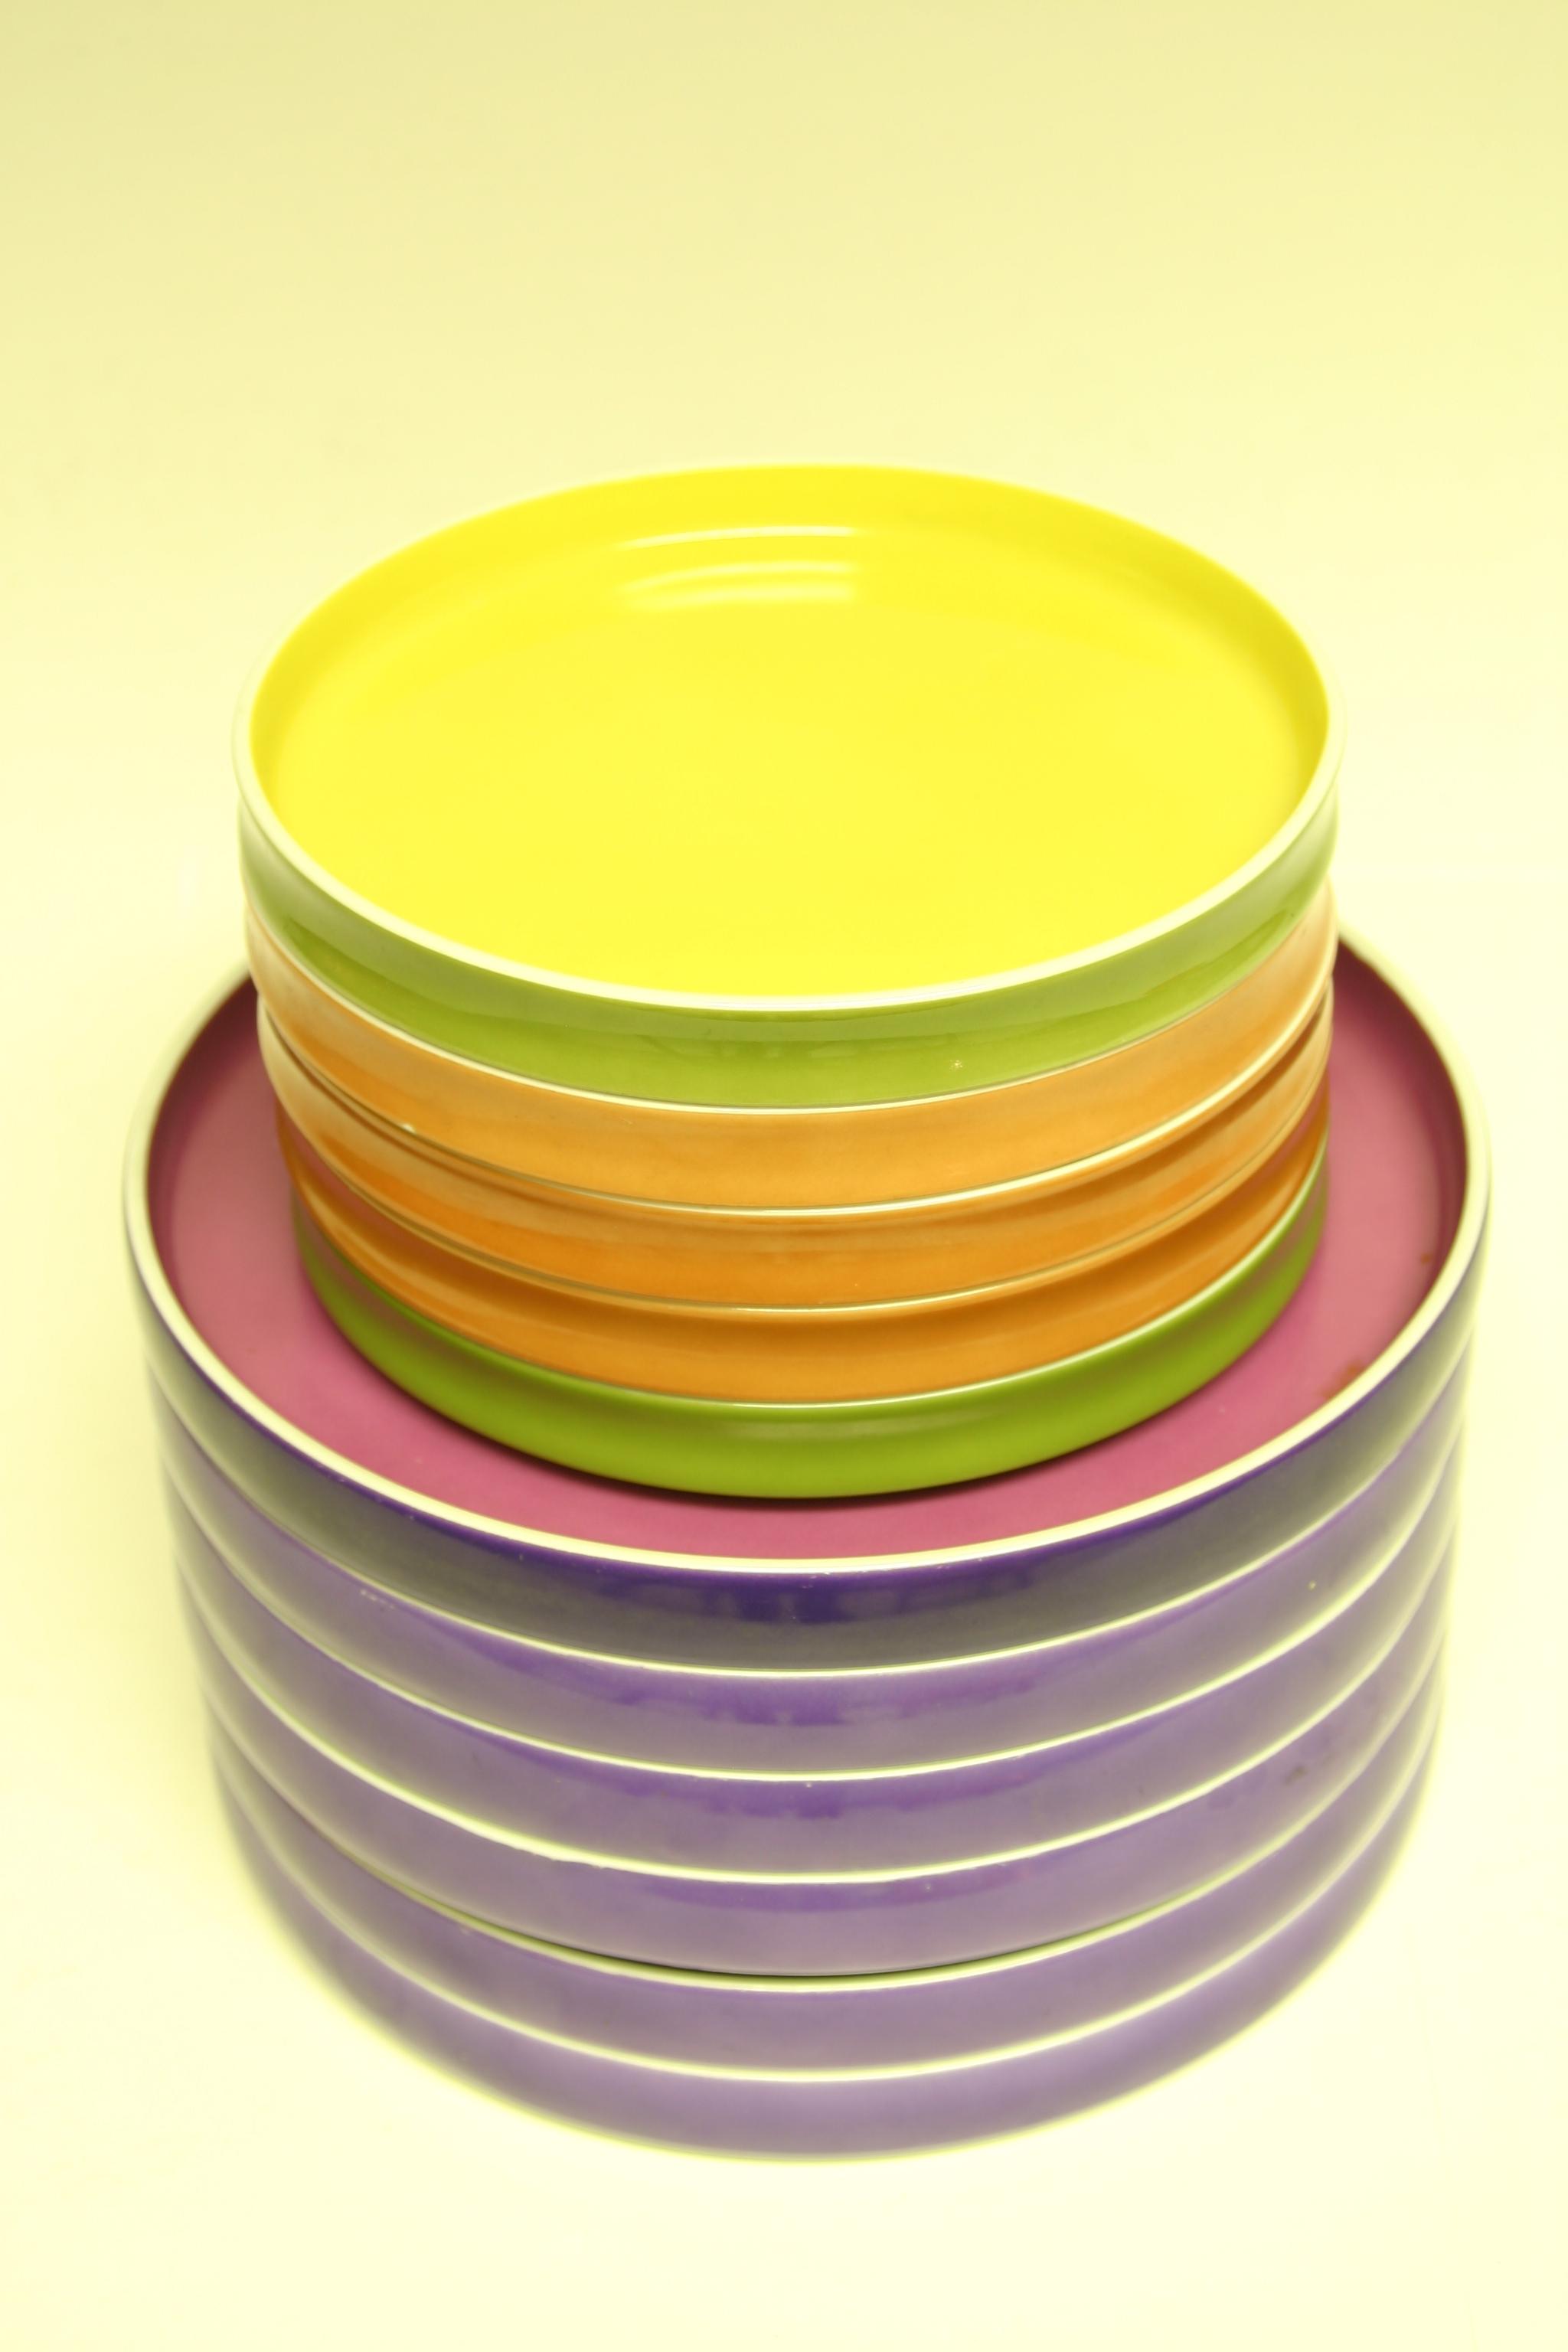 Stacking plates